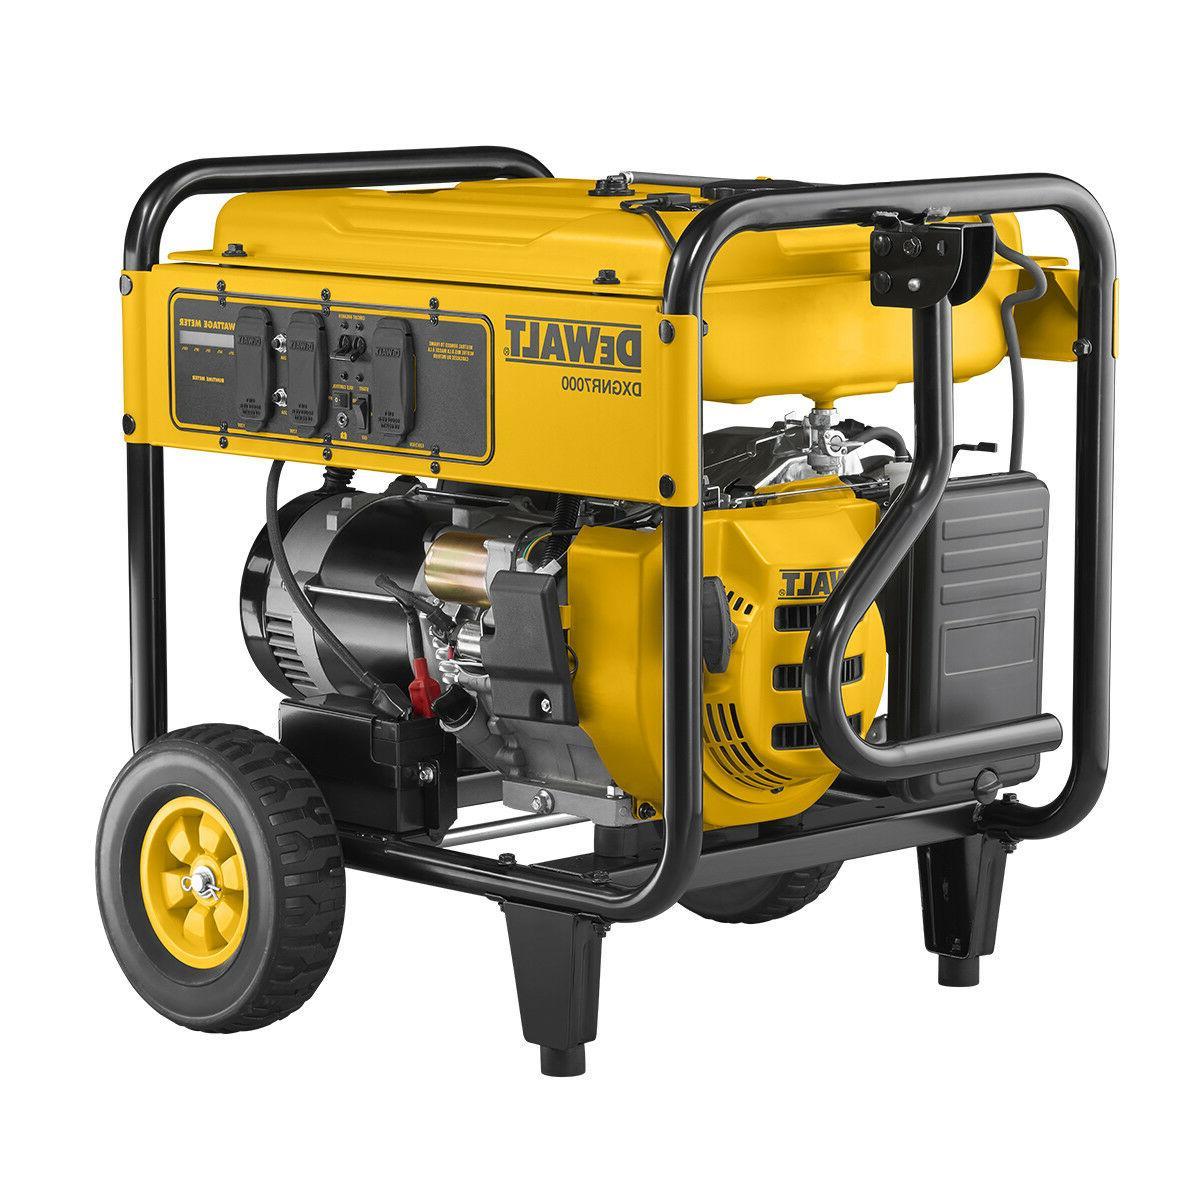 7000 watt portable generator new electric start